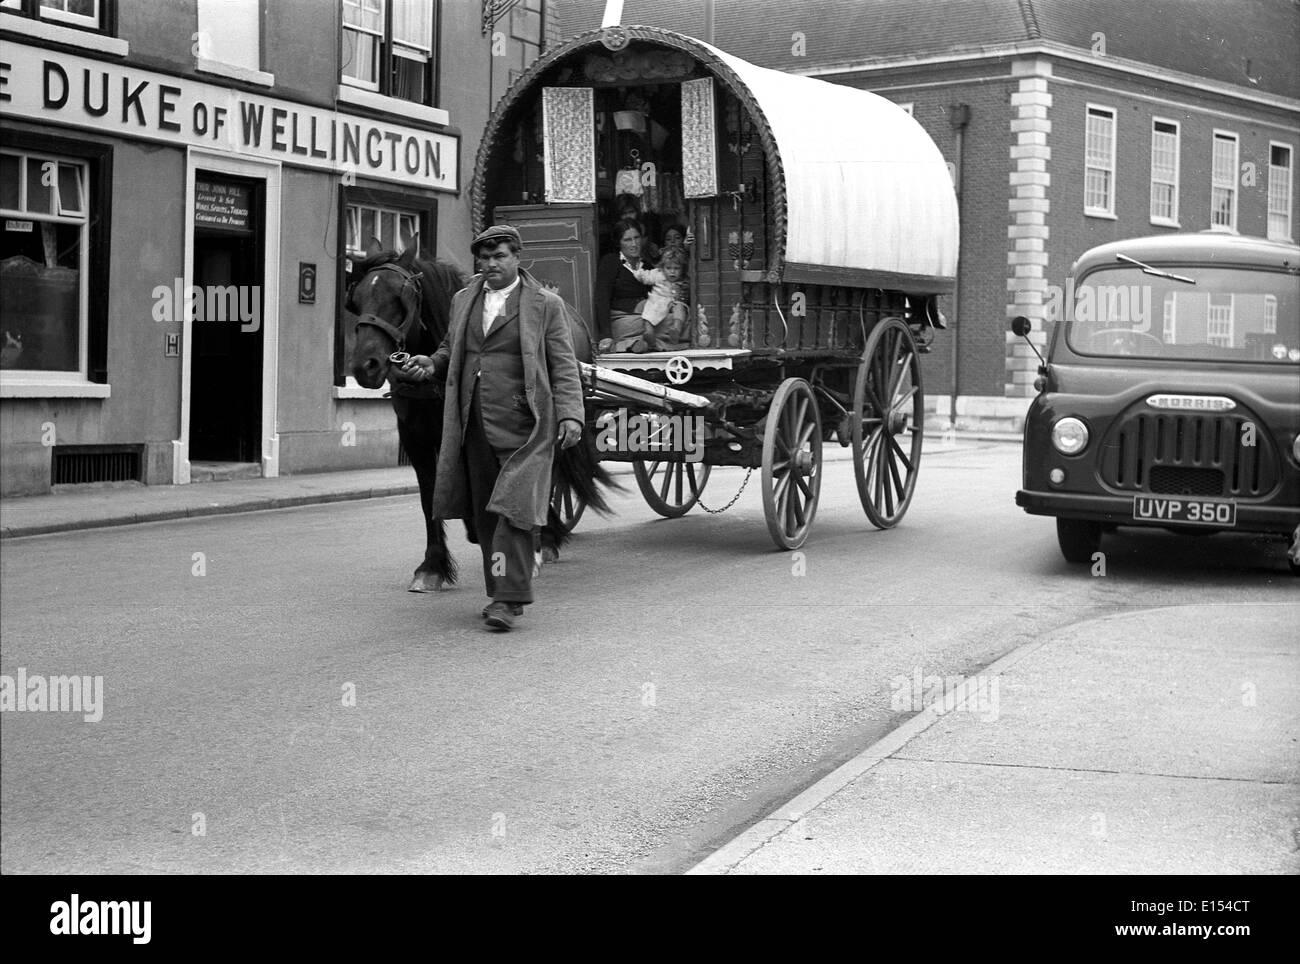 Gypsy traveller family in bow top caravan 1950s Britain - Stock Image